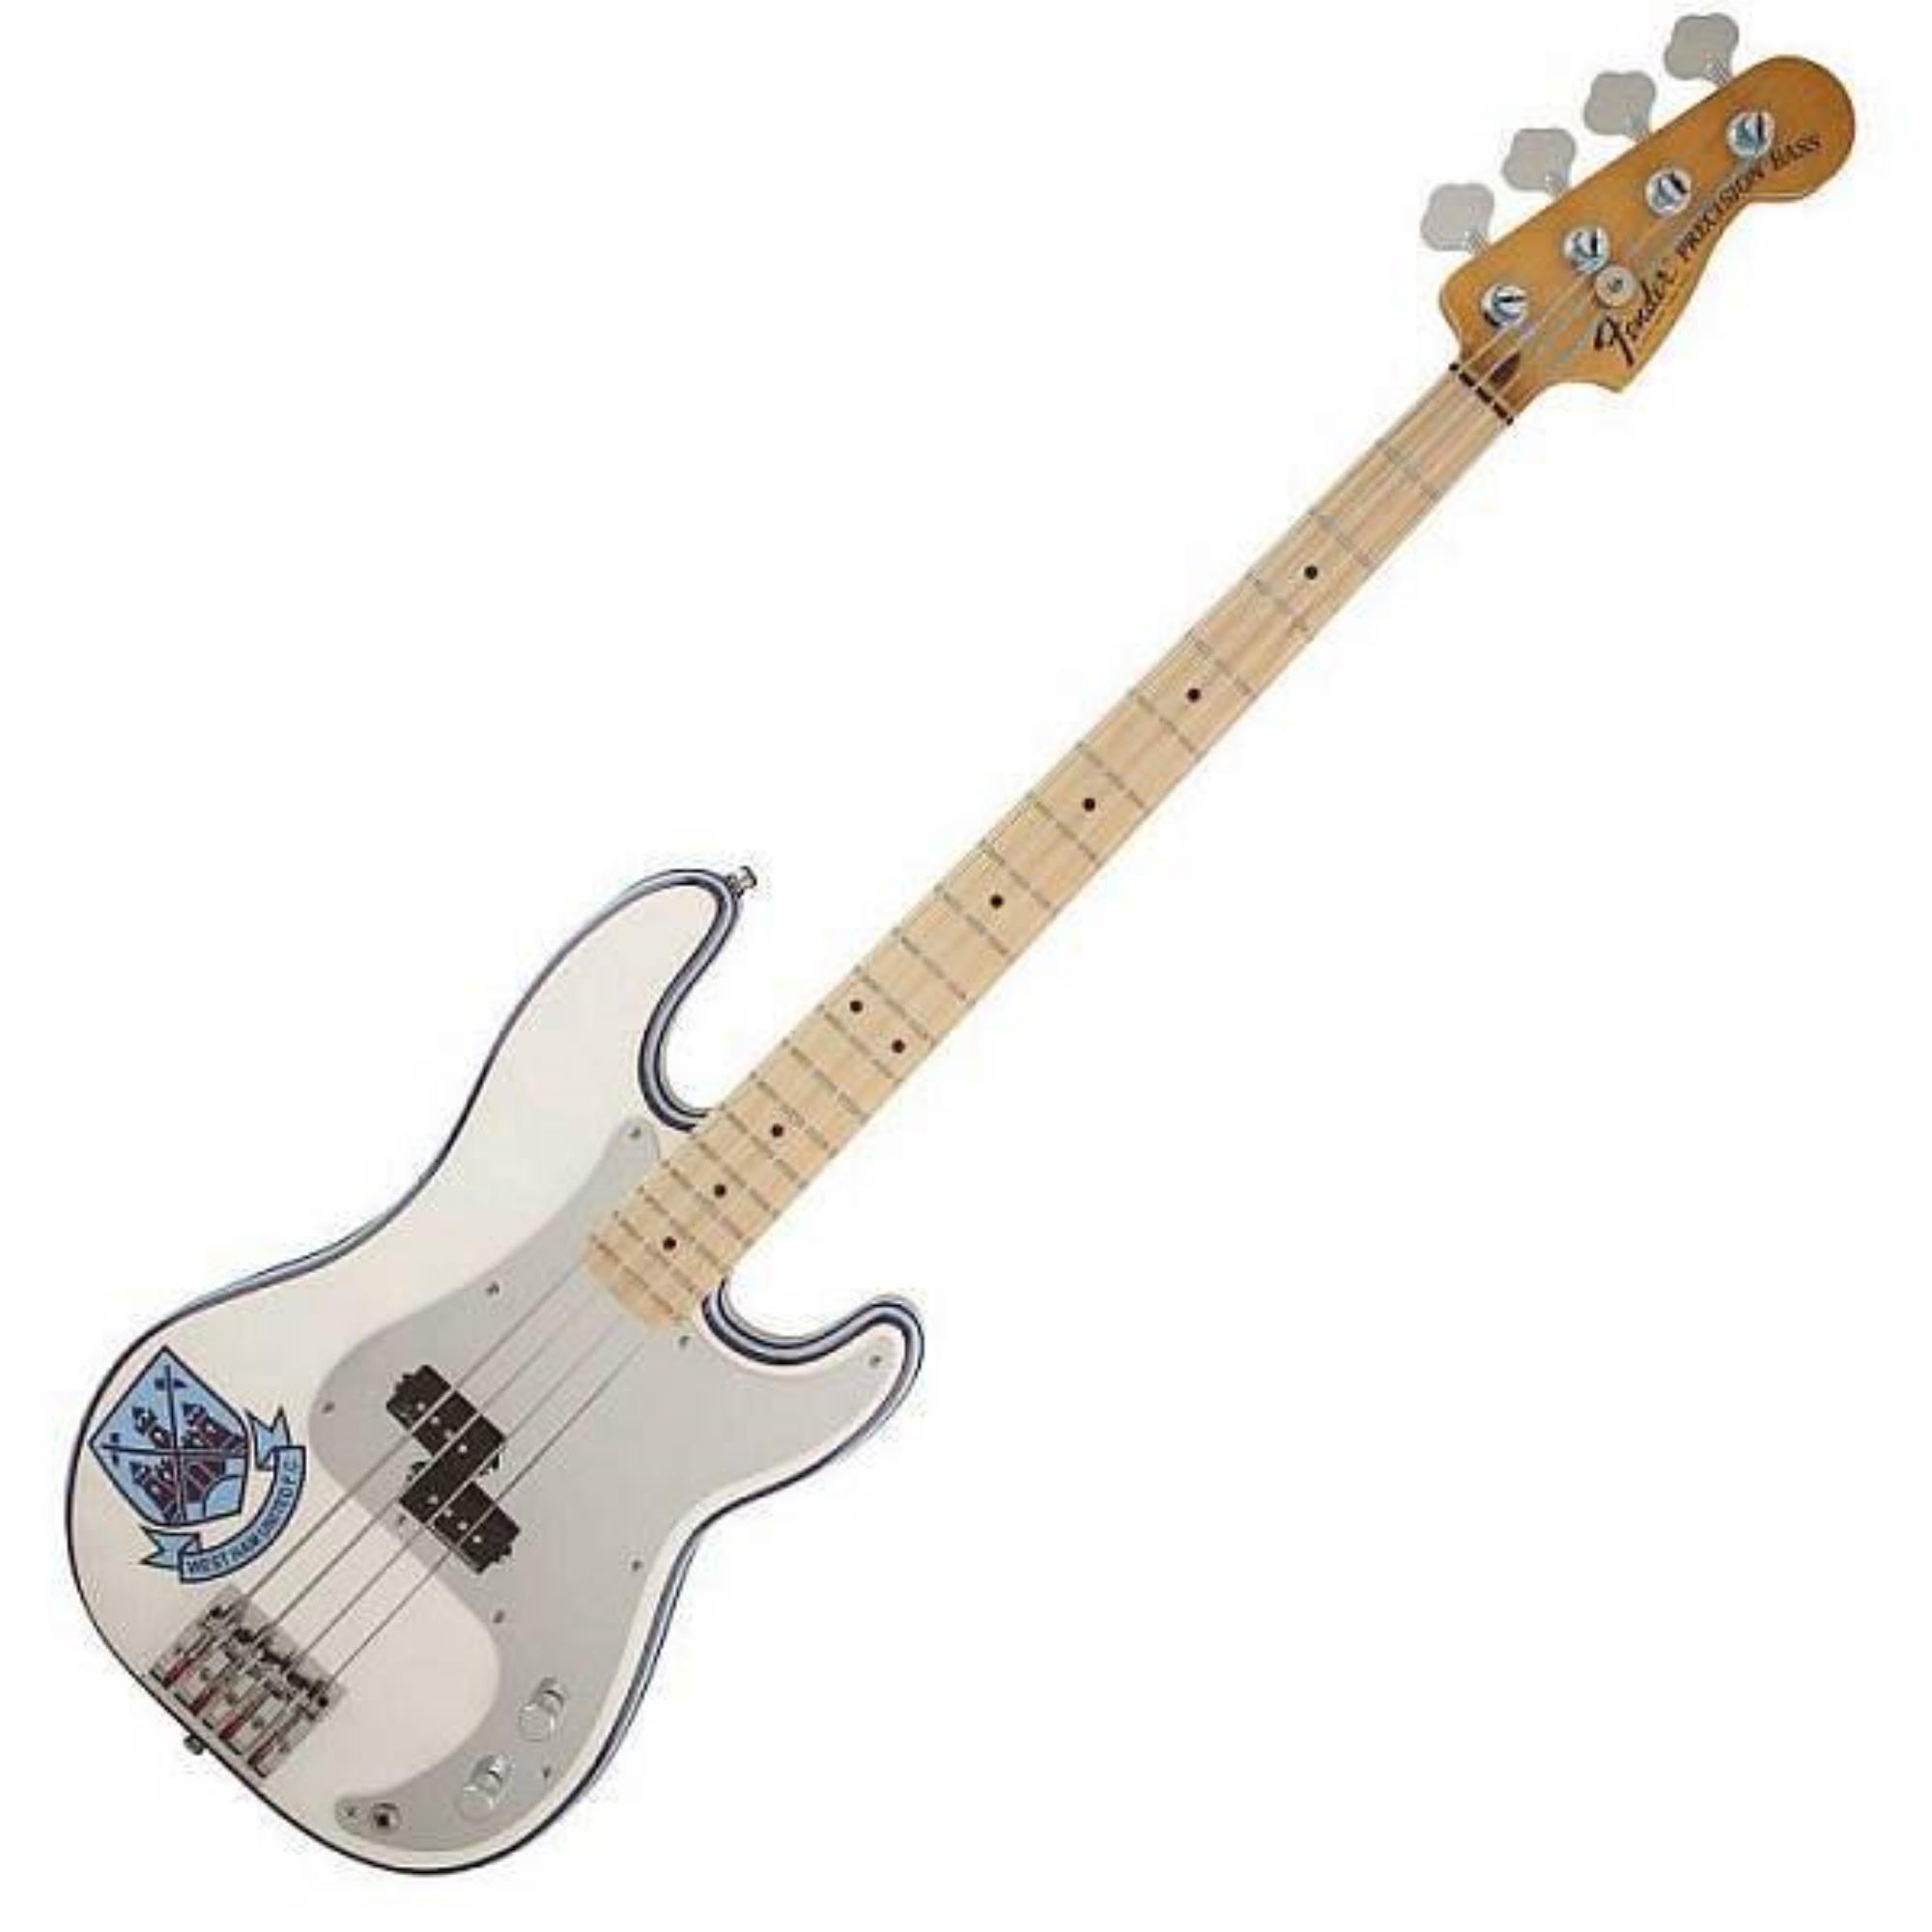 FENDER-Steve-Harris-Precision-Bass-MN-Olympic-White-0141032305-sku-24691